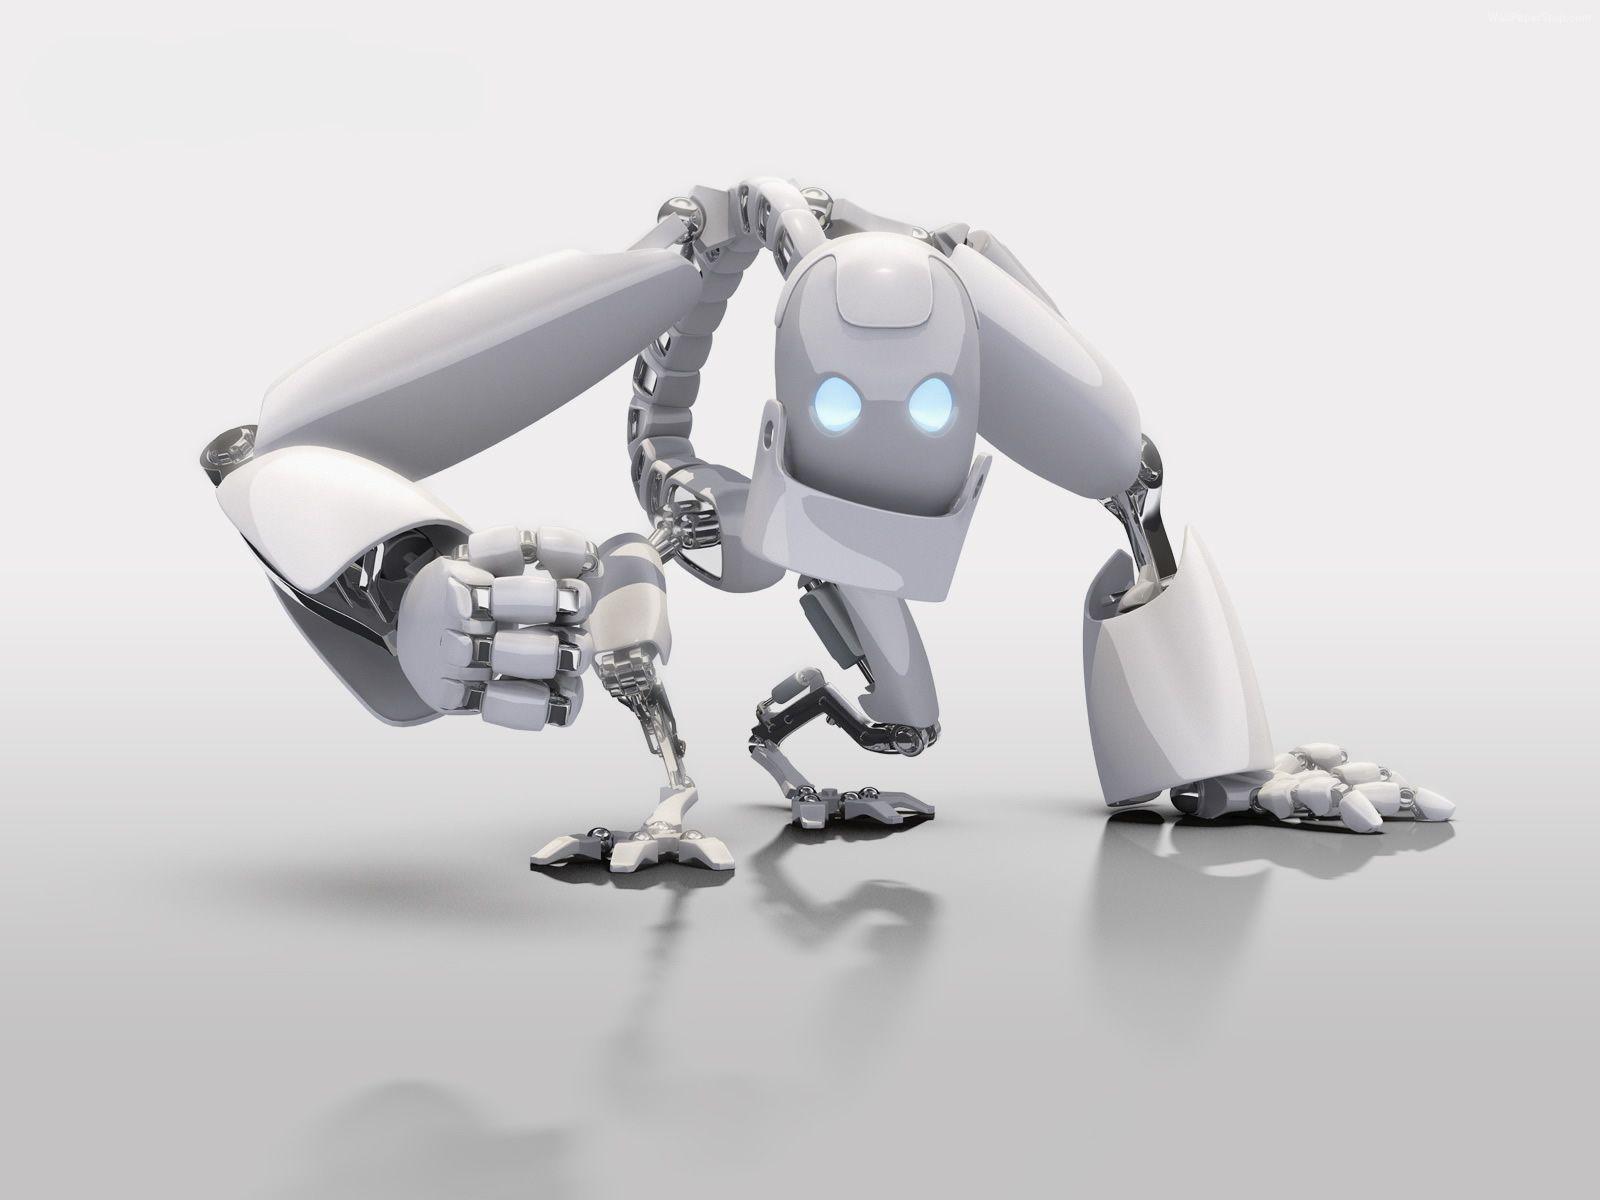 www 3d@ cg skupt robots pin it | 3d robot desktop background - hd